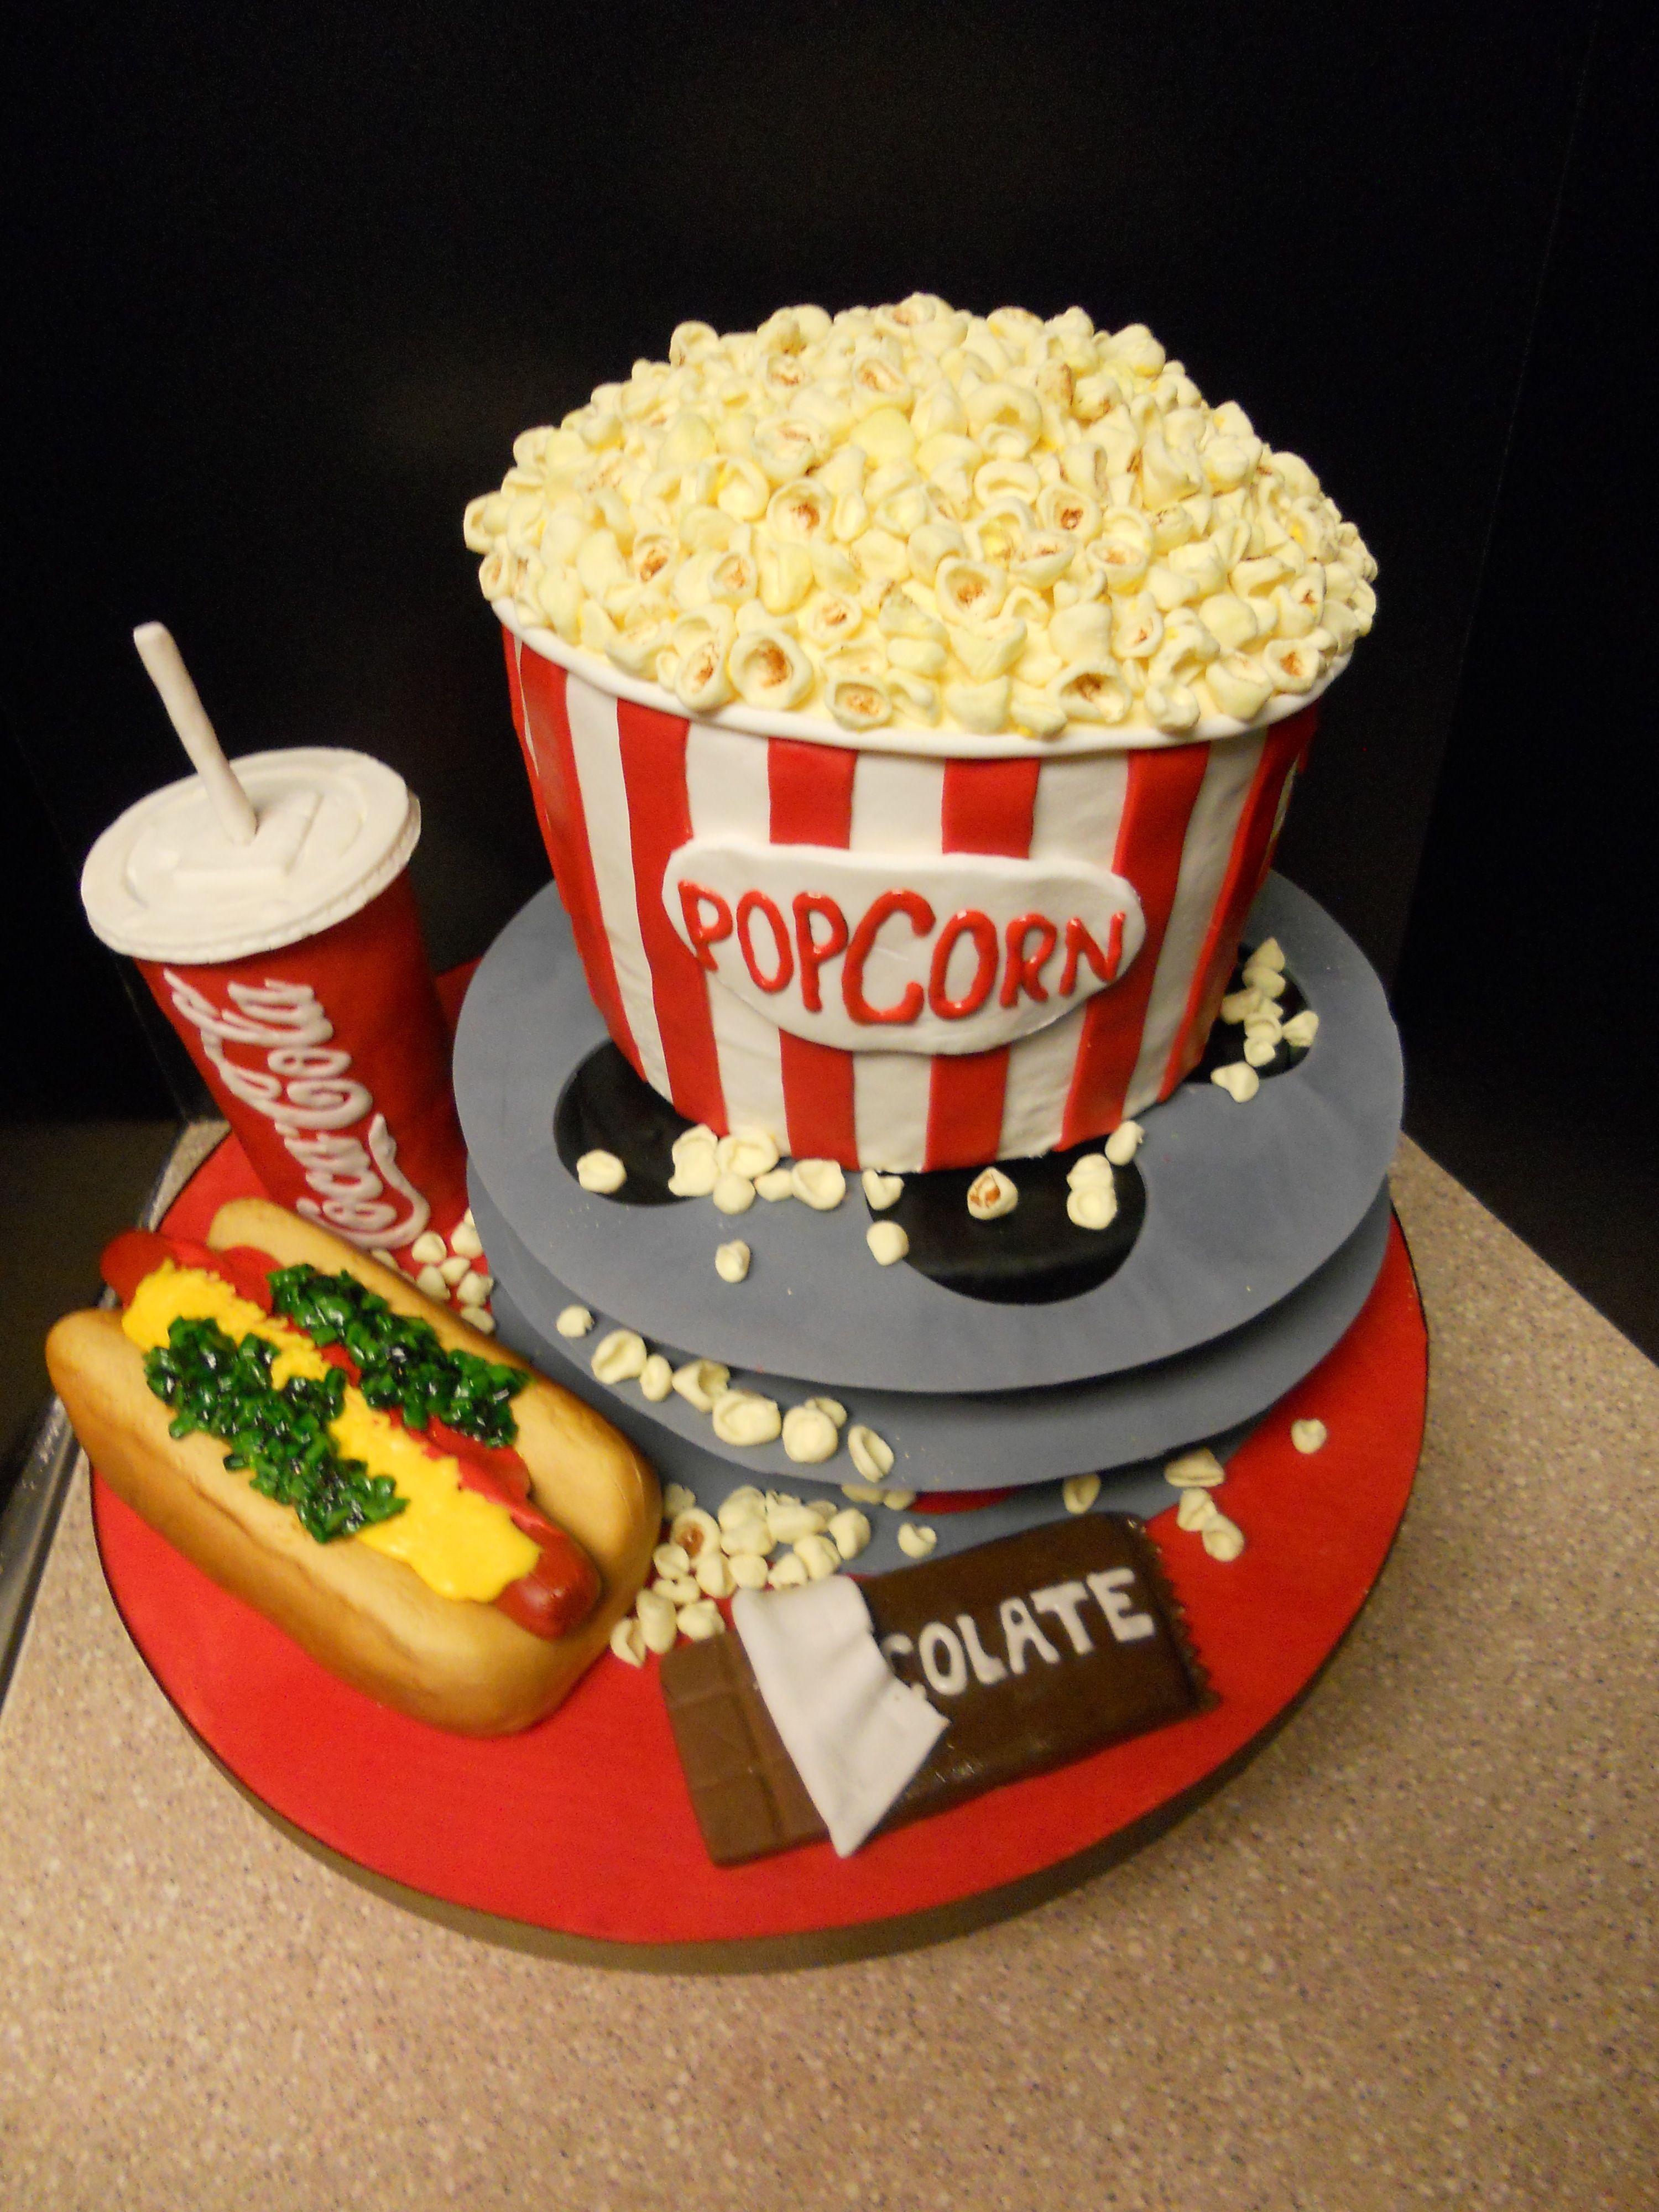 Its Showtime Movie Cakes Cake And Movie - Movie themed birthday cake